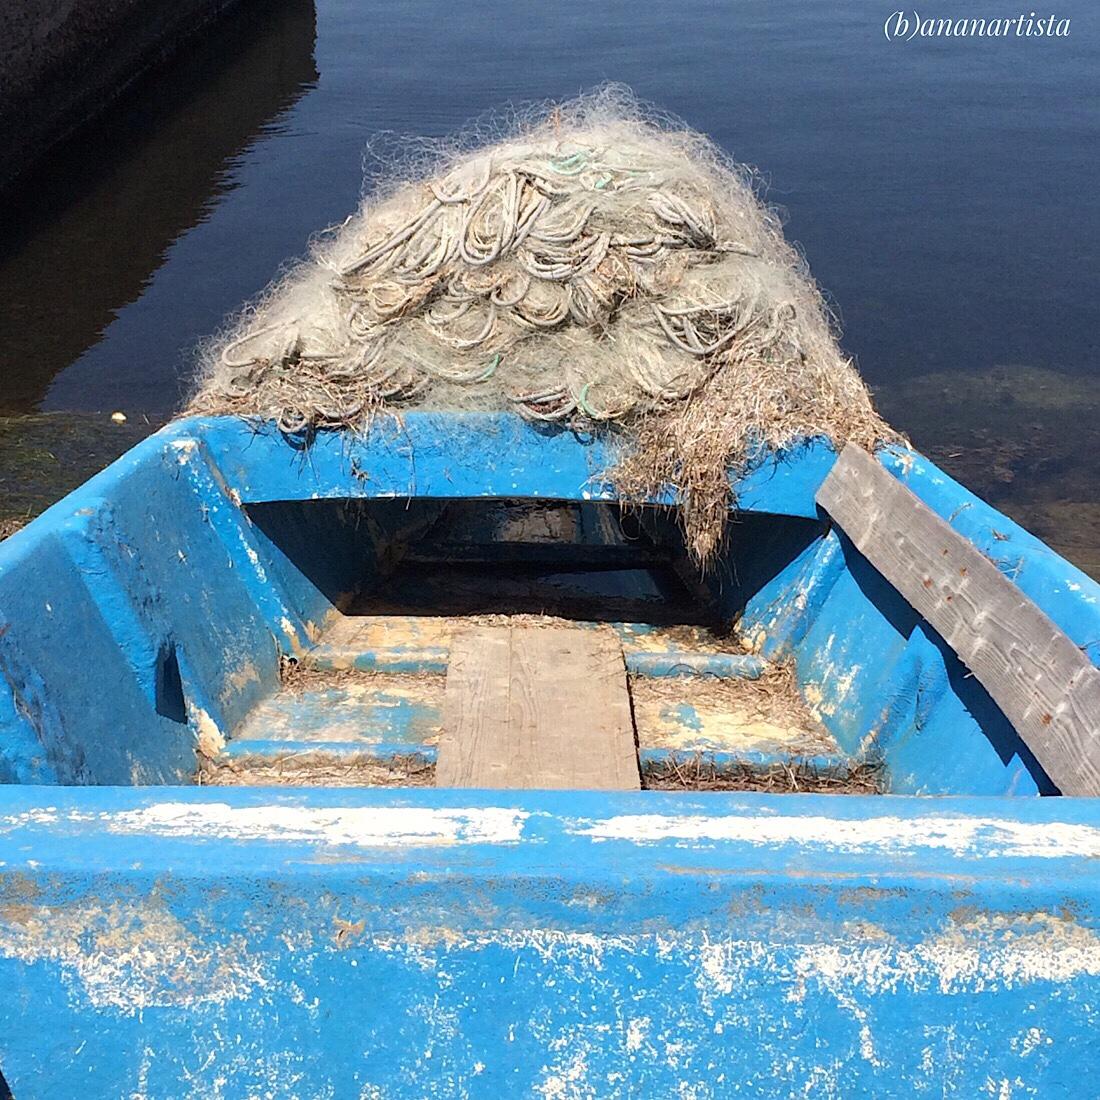 navigo in cattive acque: nave blu : fotografia di (b)ananartista sbuff